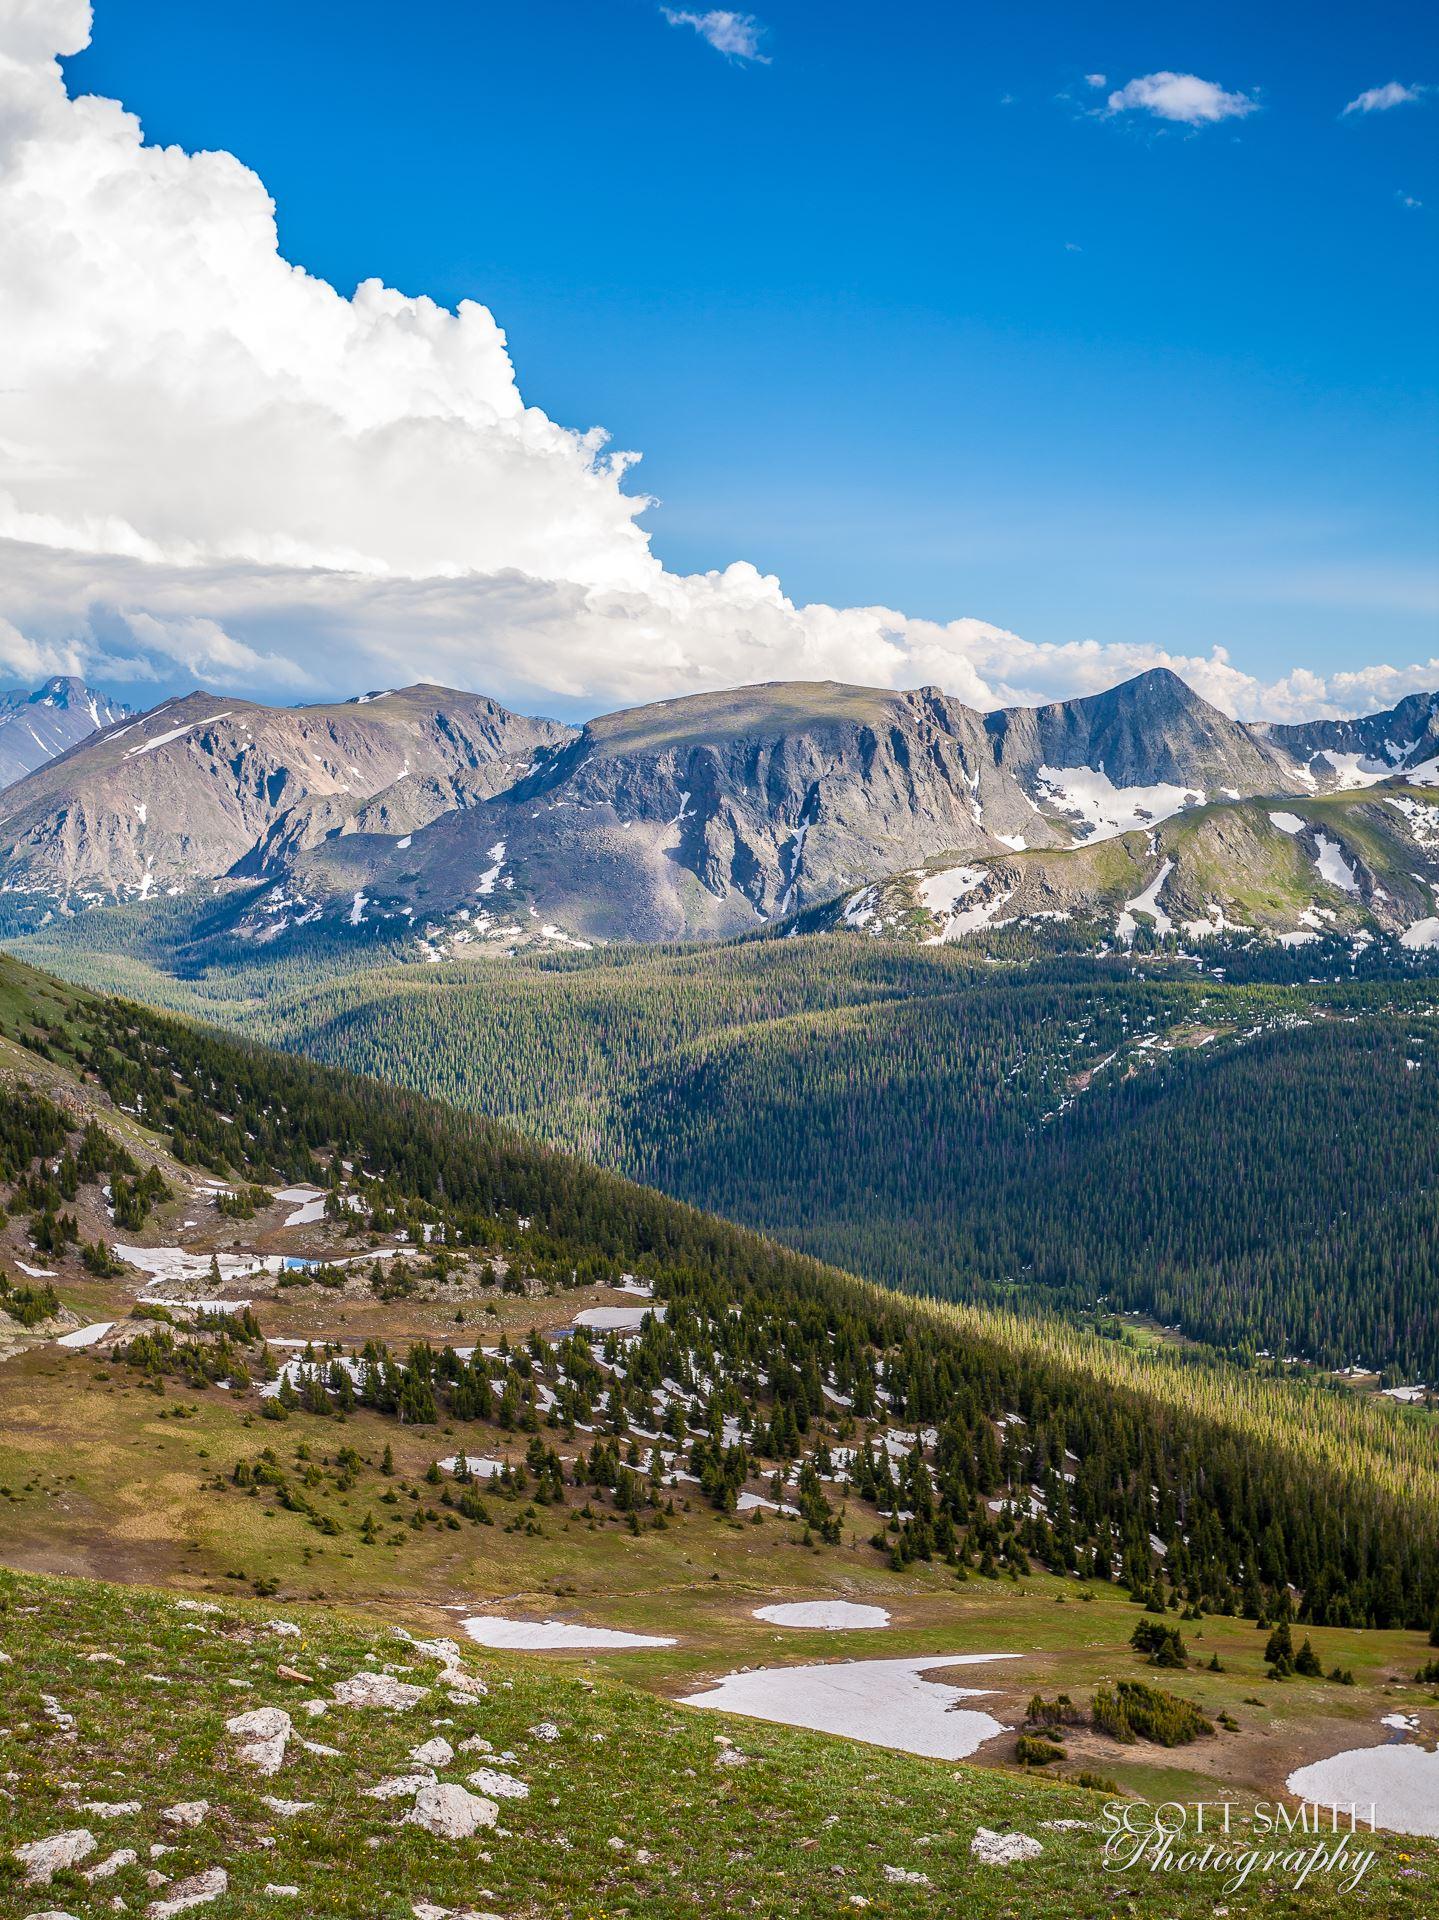 Rocky Mountain National Park 1 -  by D Scott Smith